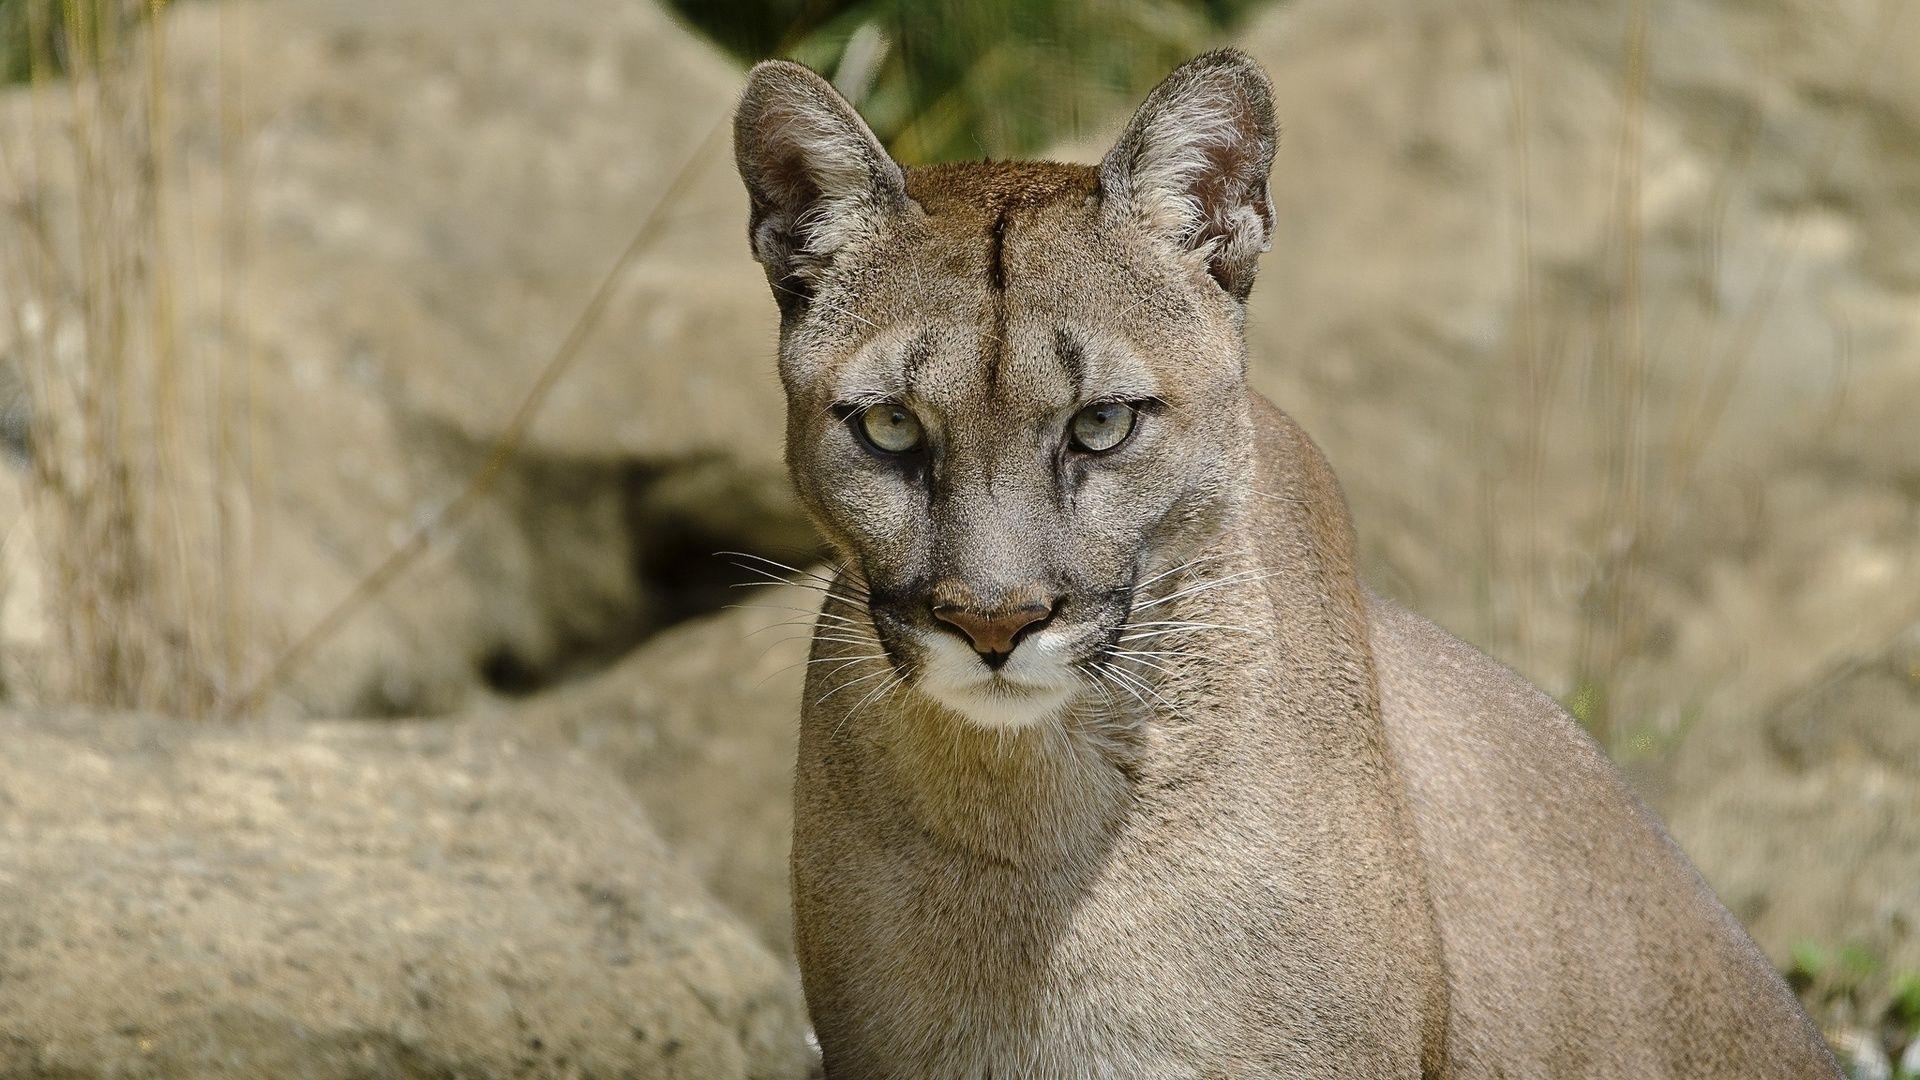 Cougar Hd background hd